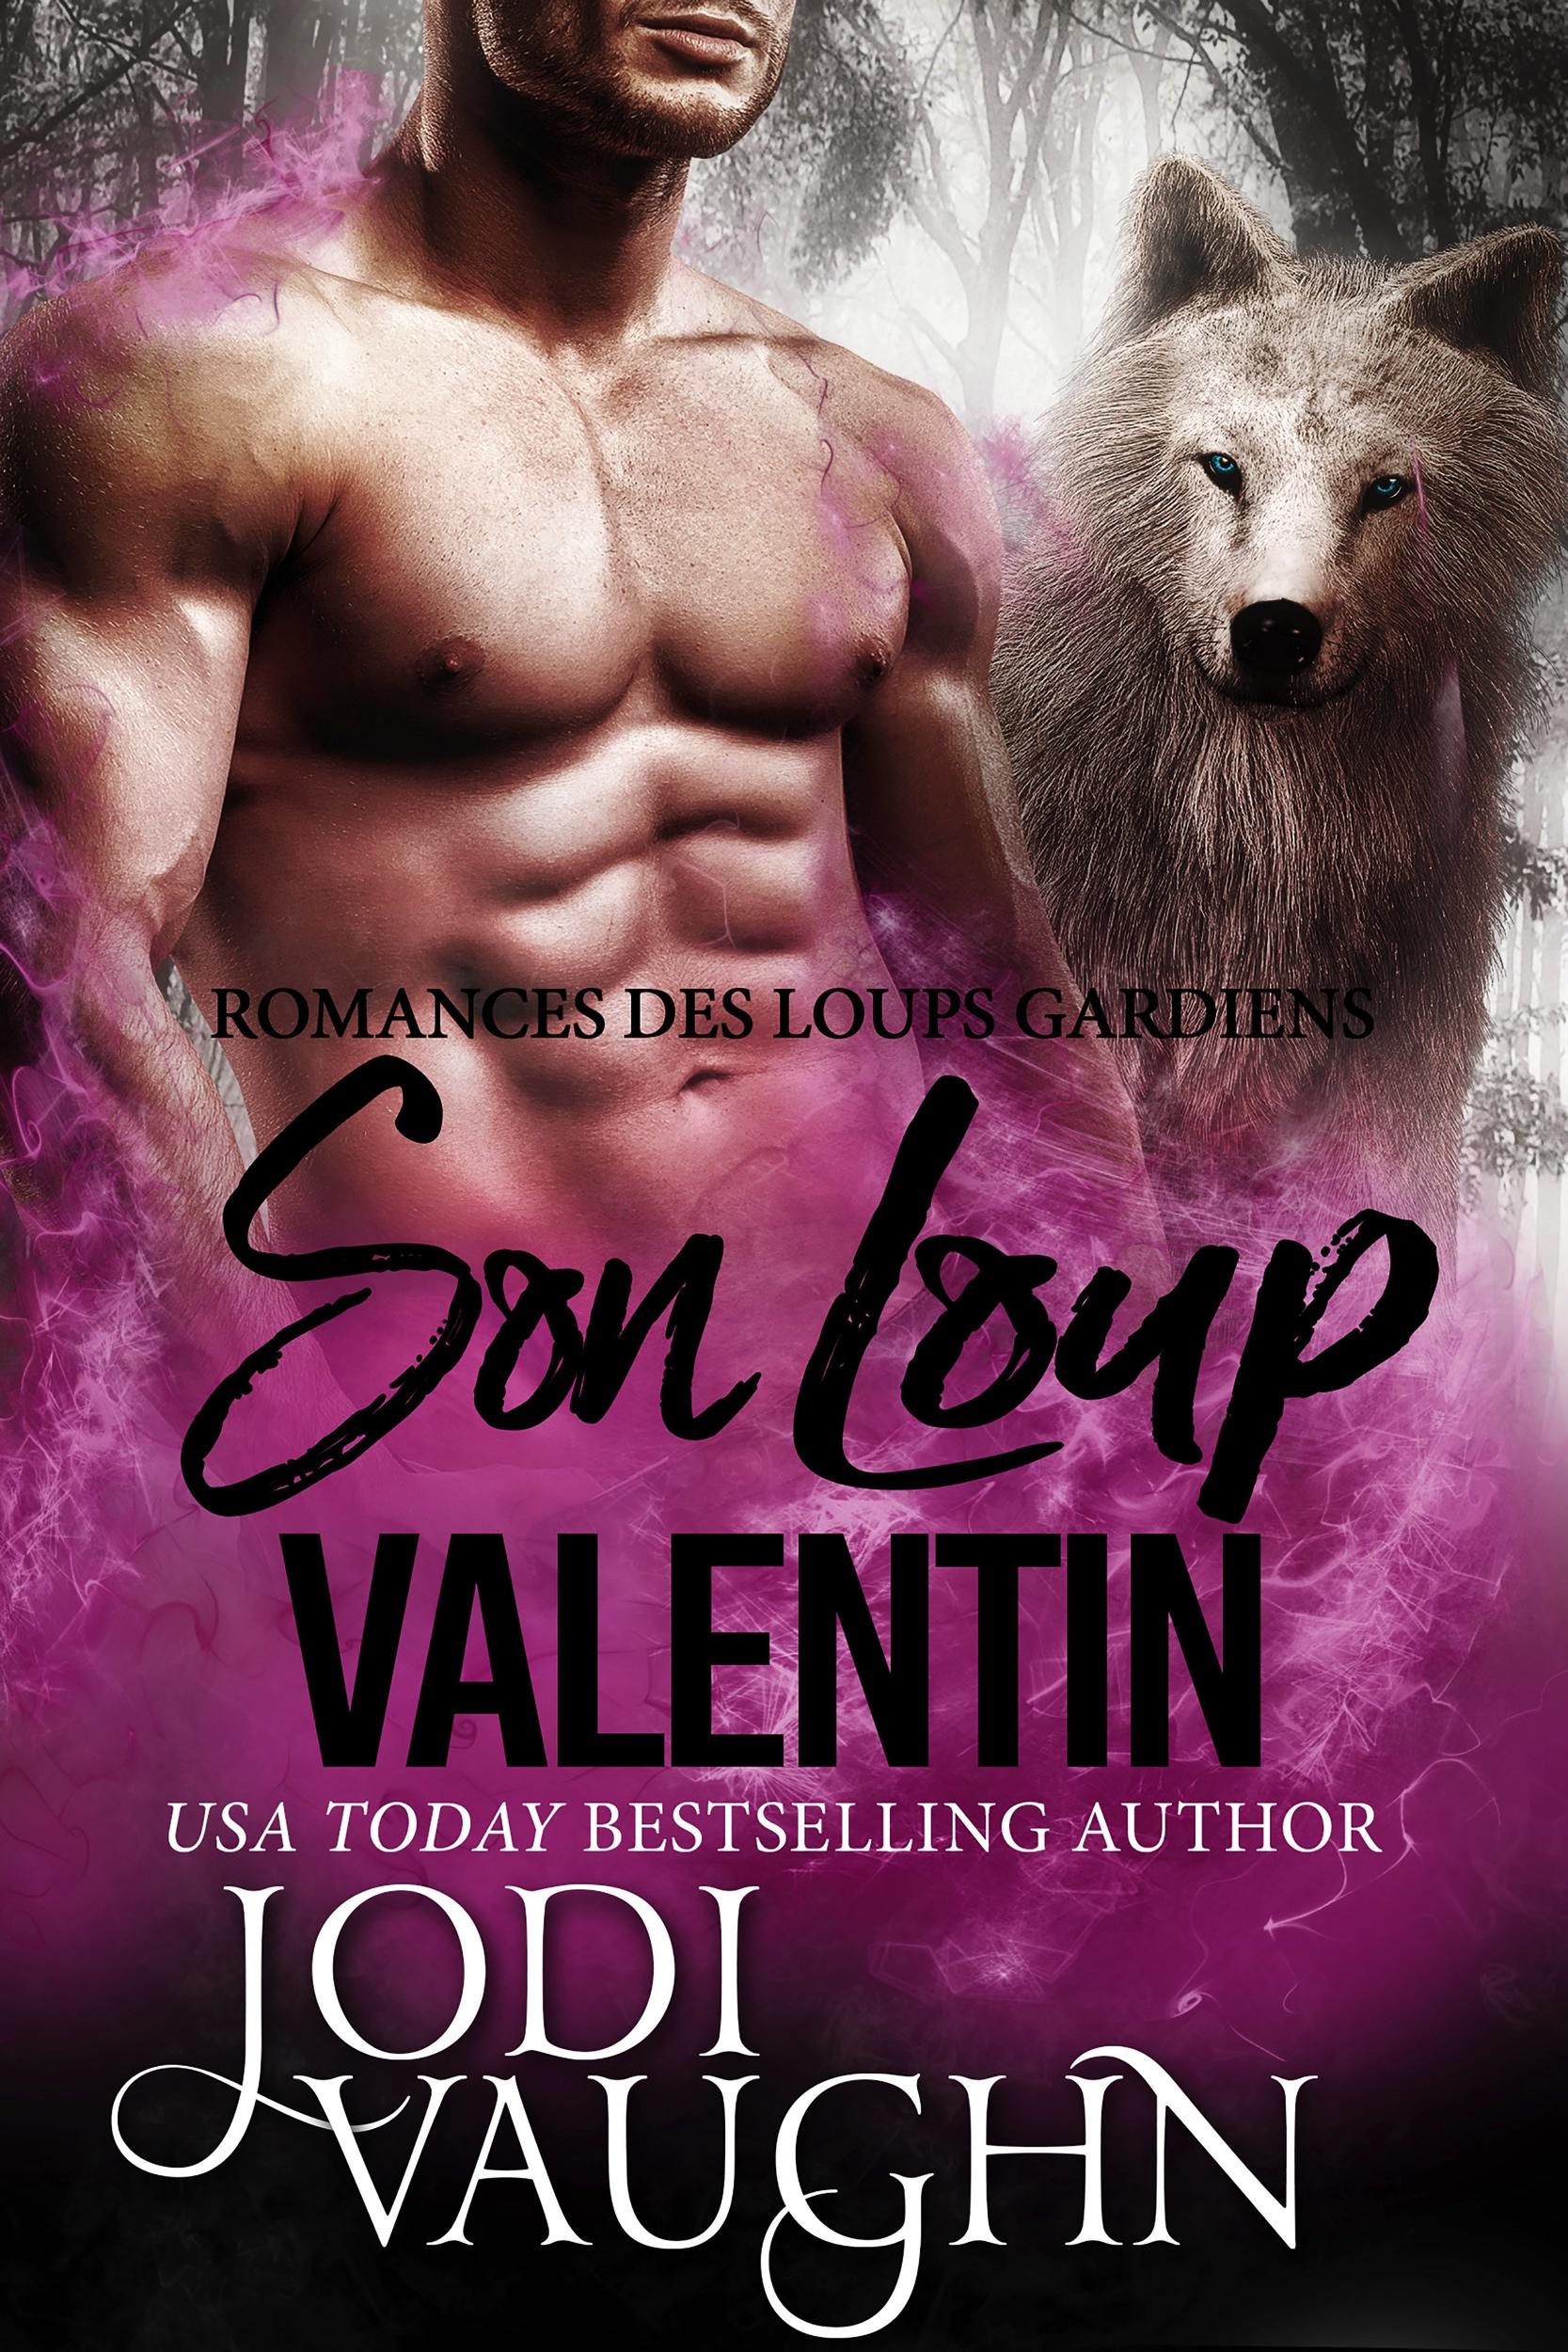 Son Loup Valentin